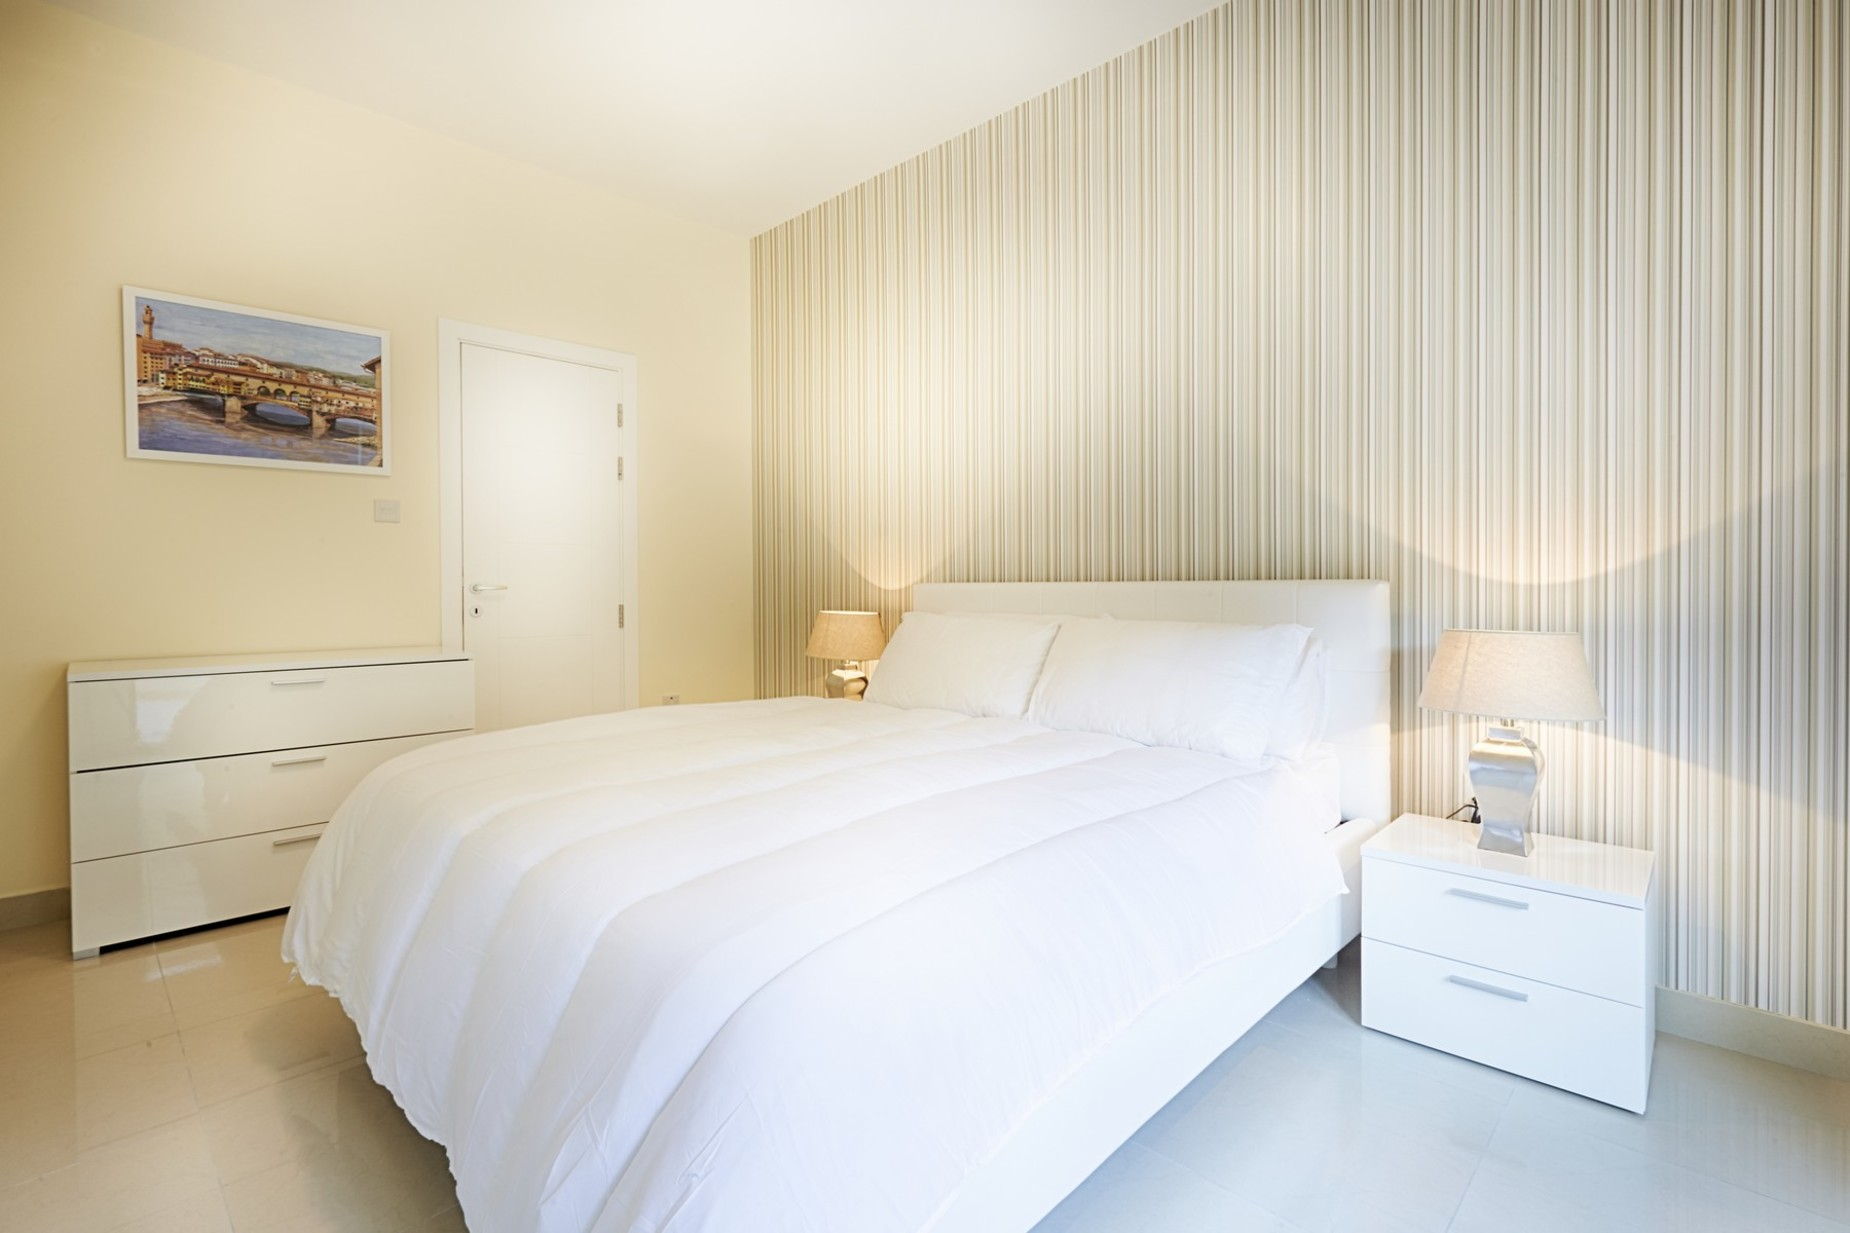 3 bed Apartment For Rent in Naxxar, Naxxar - thumb 3